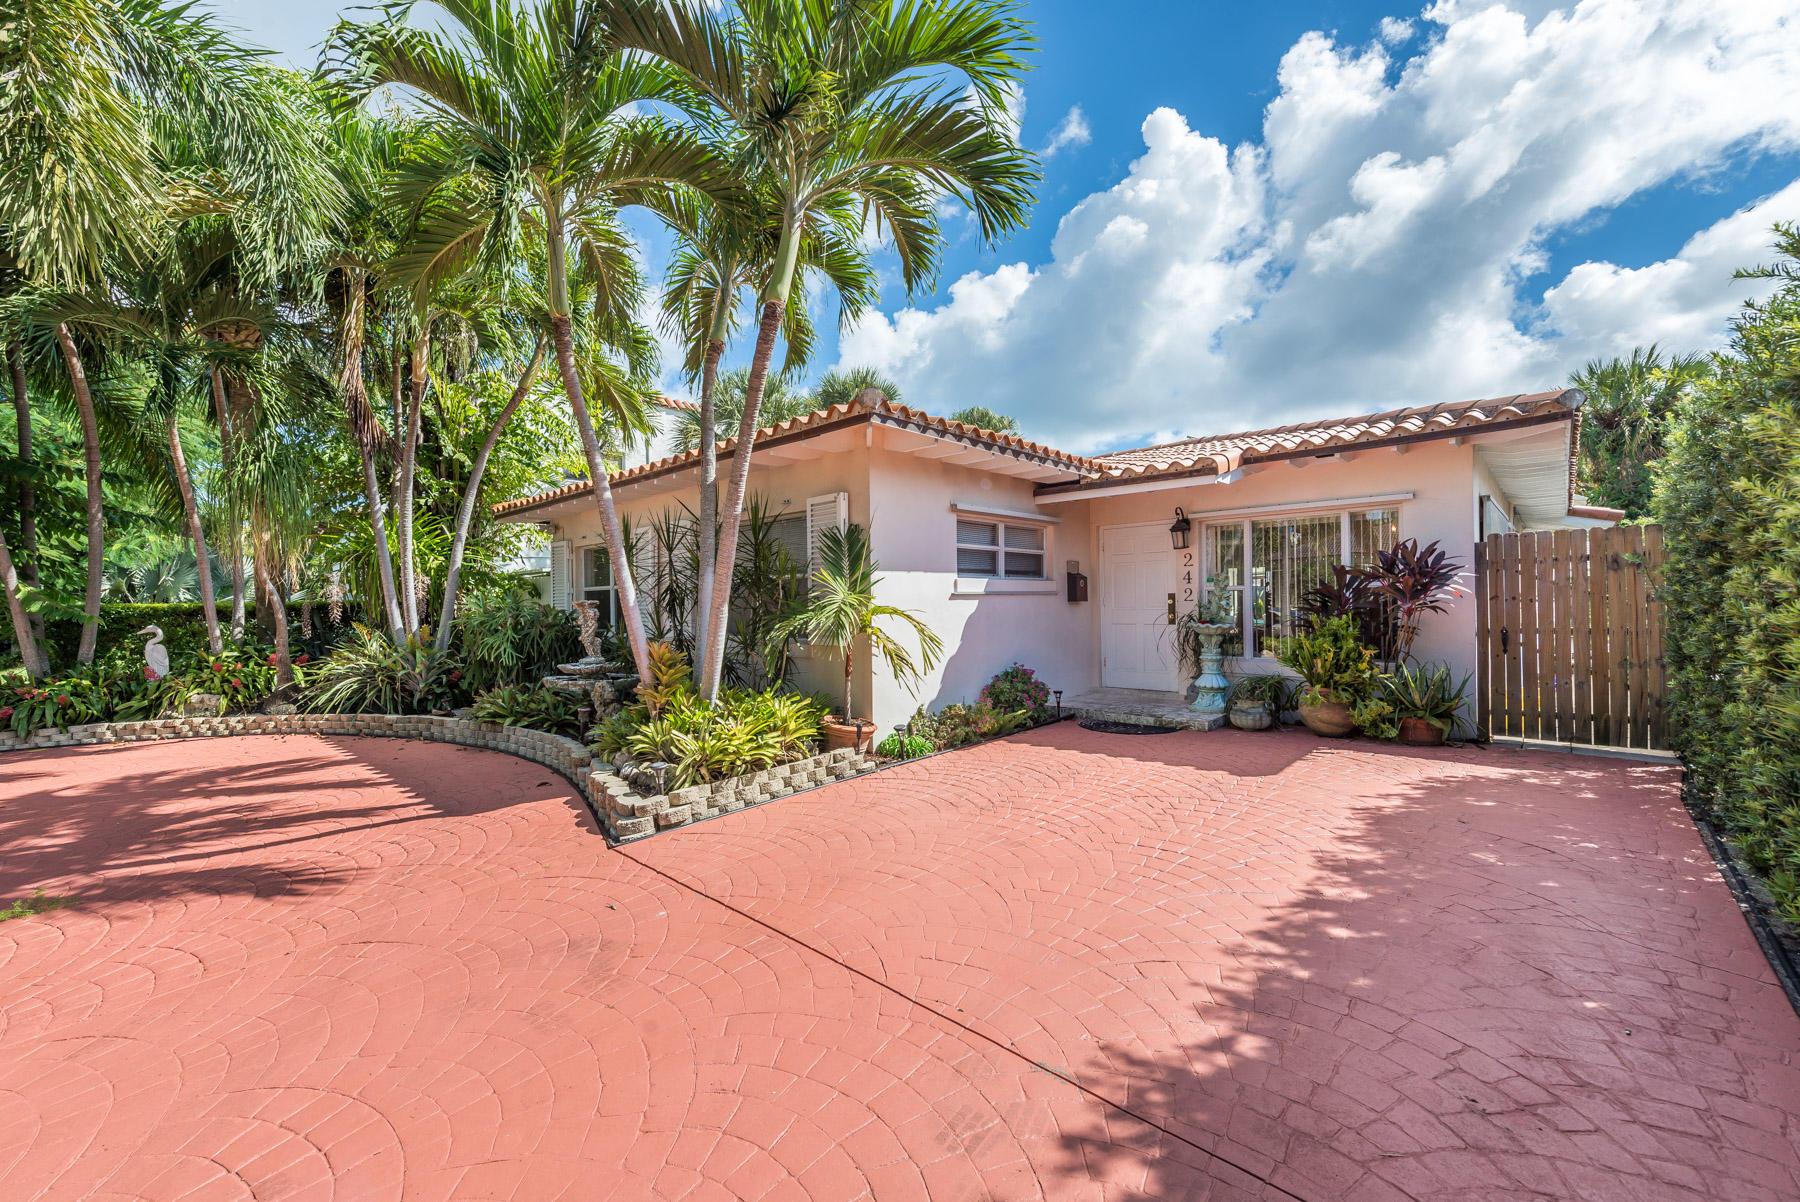 Photo of 242 9th Street, West Palm Beach, FL 33401